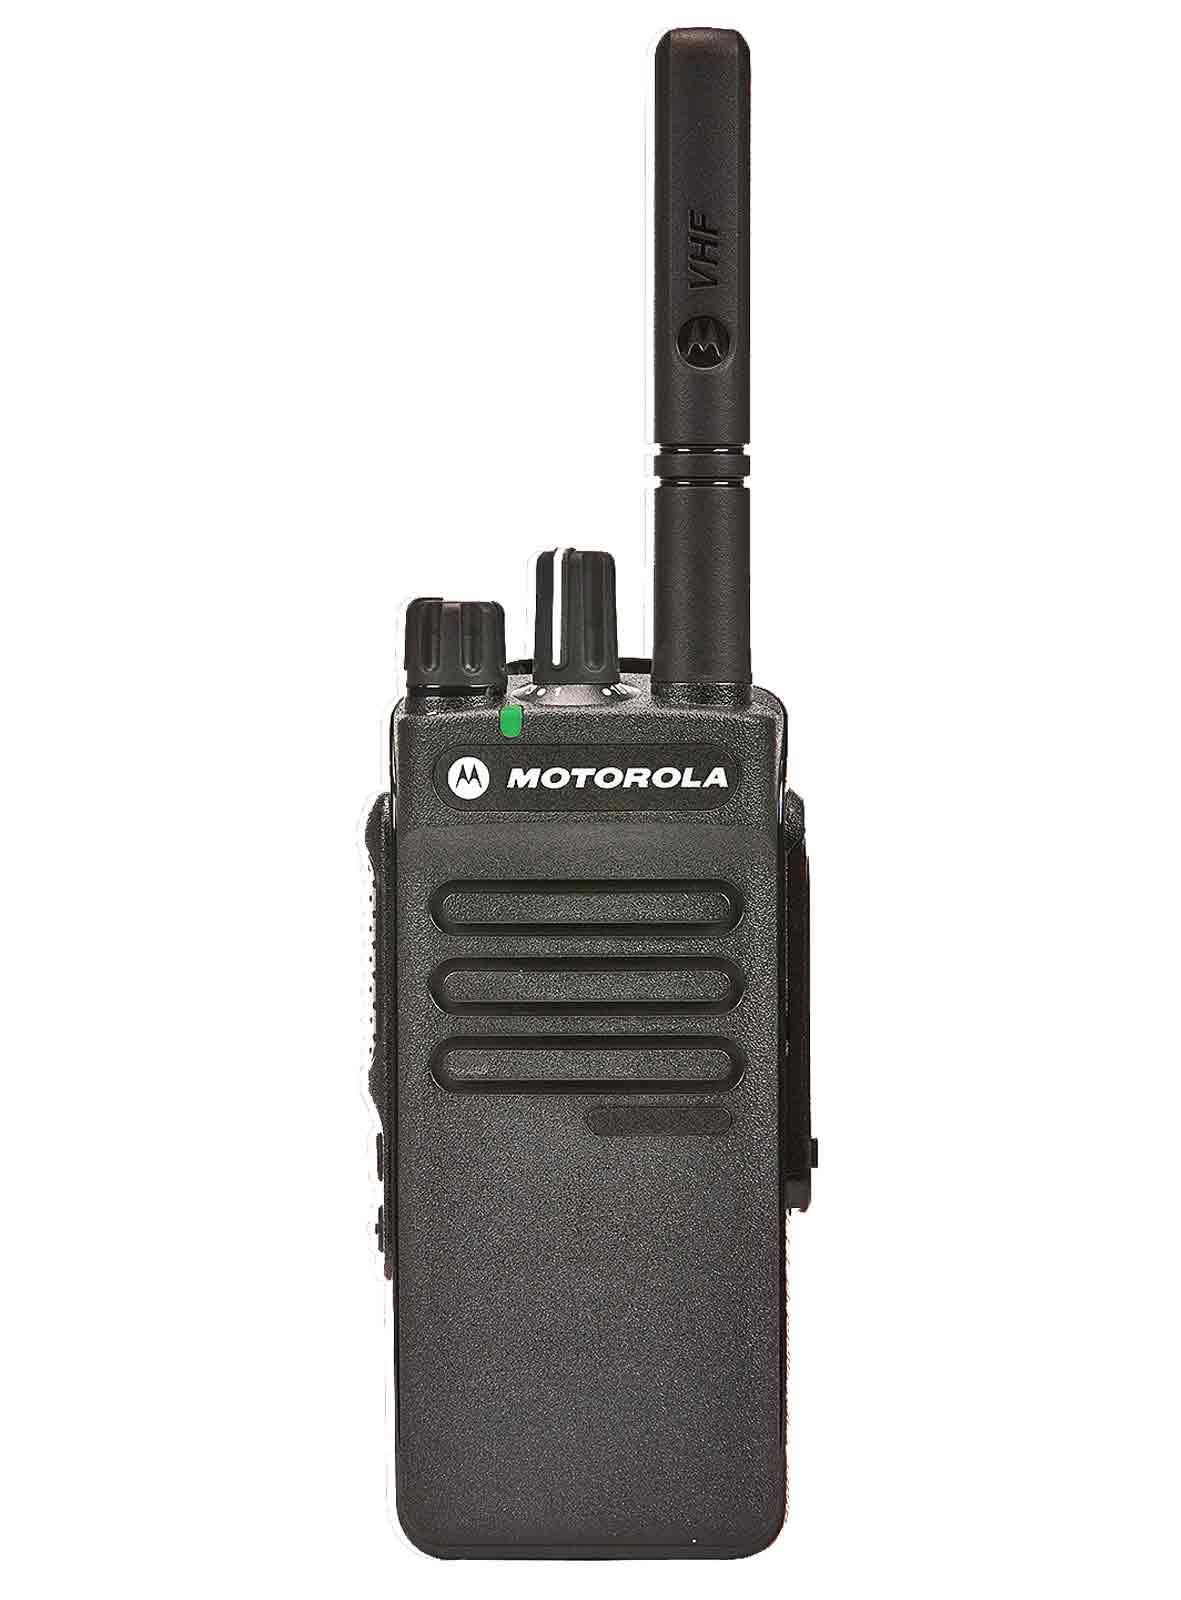 Motorola DP2400 El Telsizi